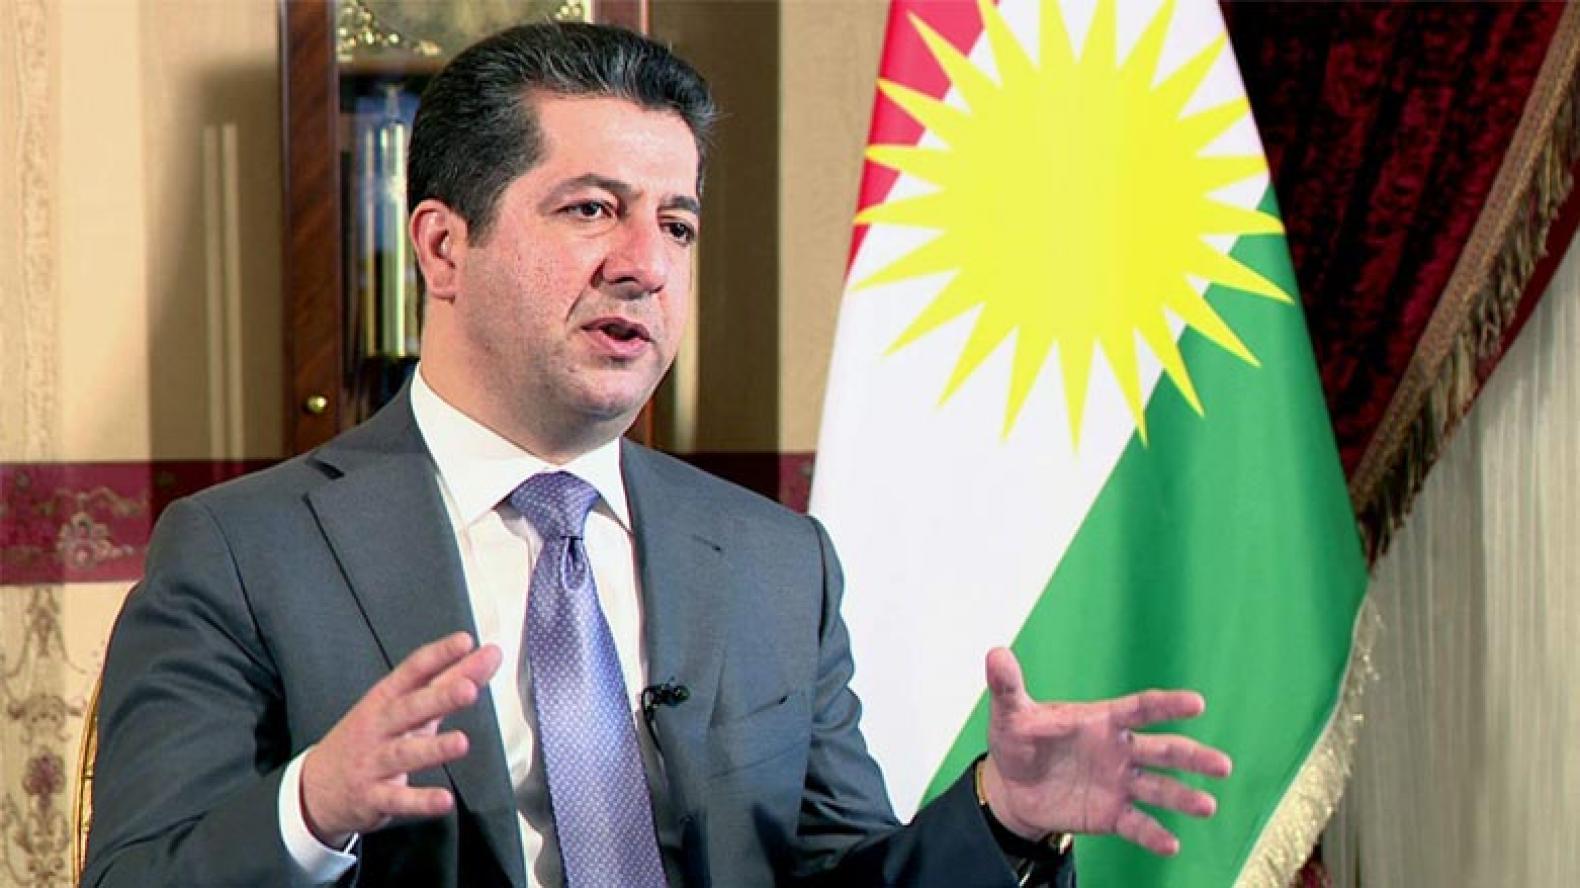 Masrour Barzani calls on the international community to help Iraq and Kurdistan to deter terrorism